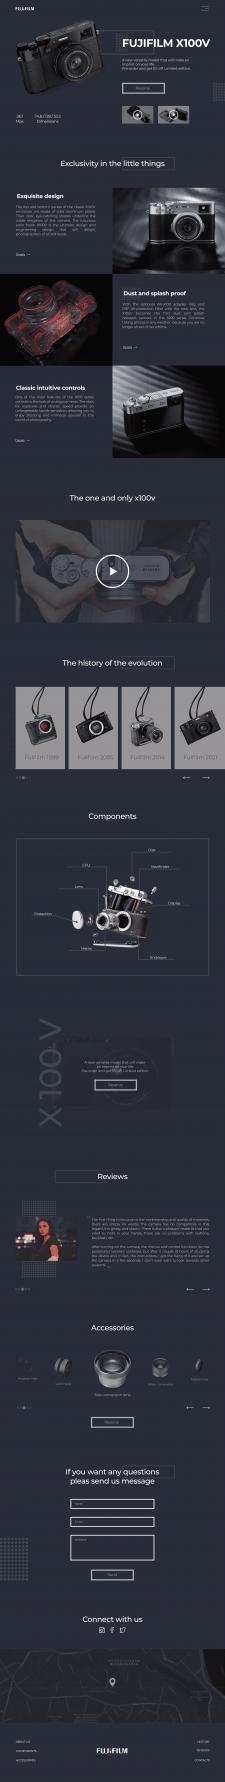 Лендинг- презентация новой модели фотоаппарата